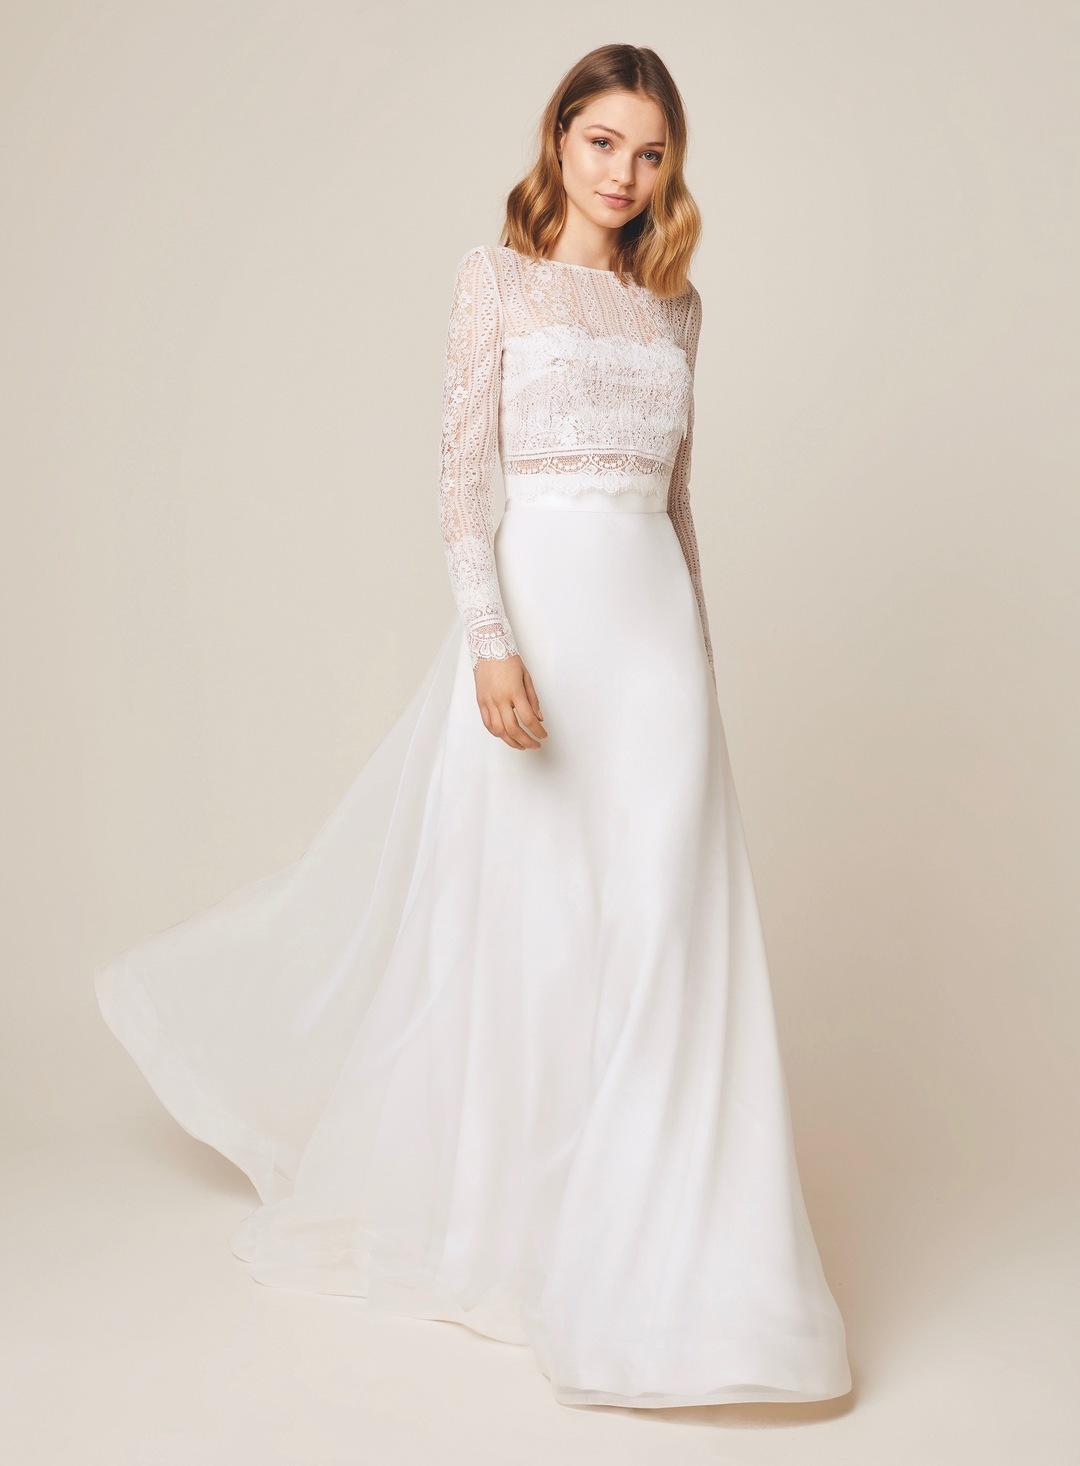 970 dress photo